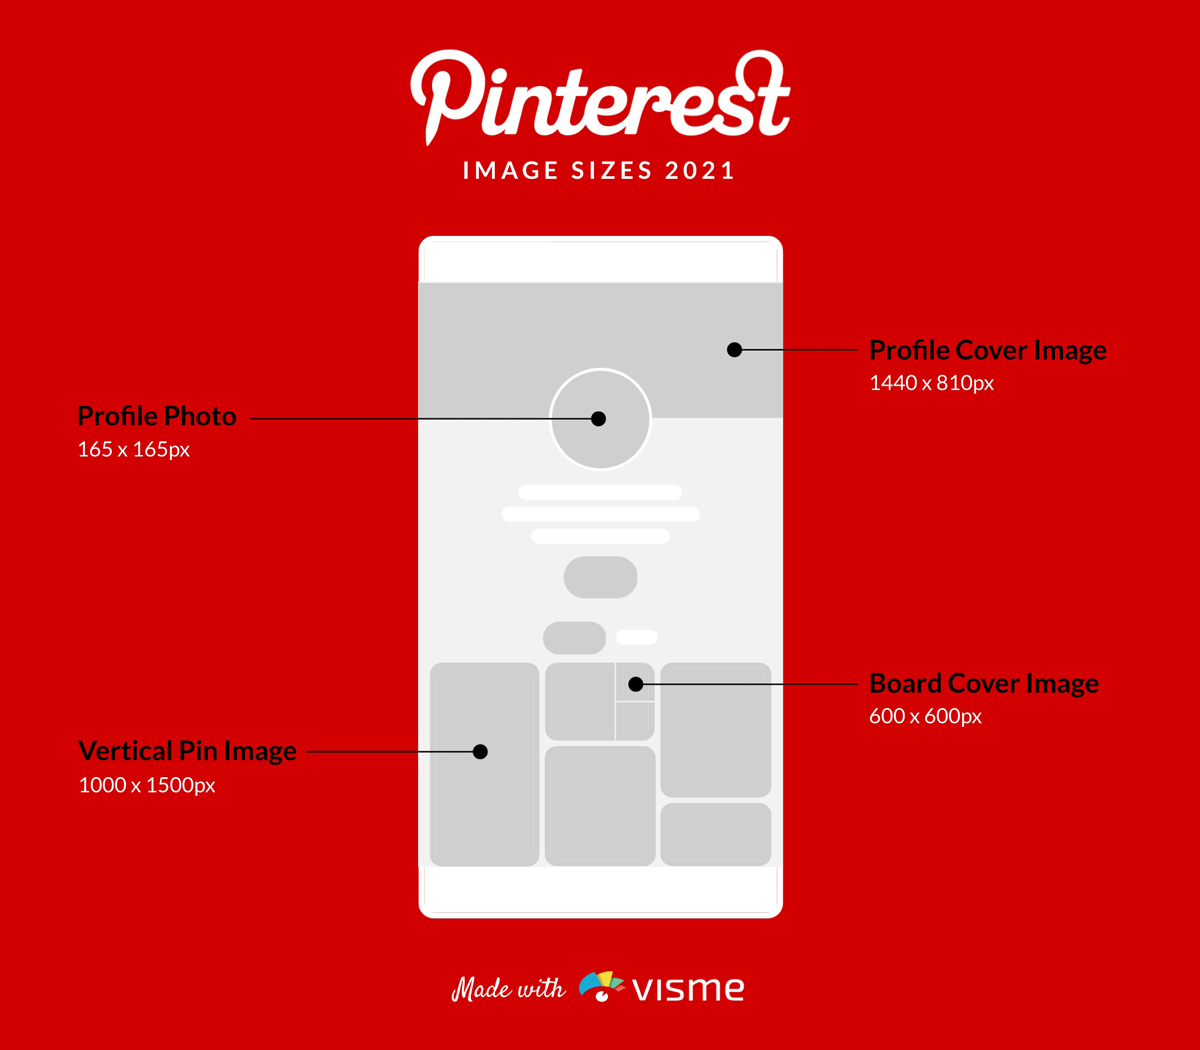 A mockup of Pinterest's image sizes.